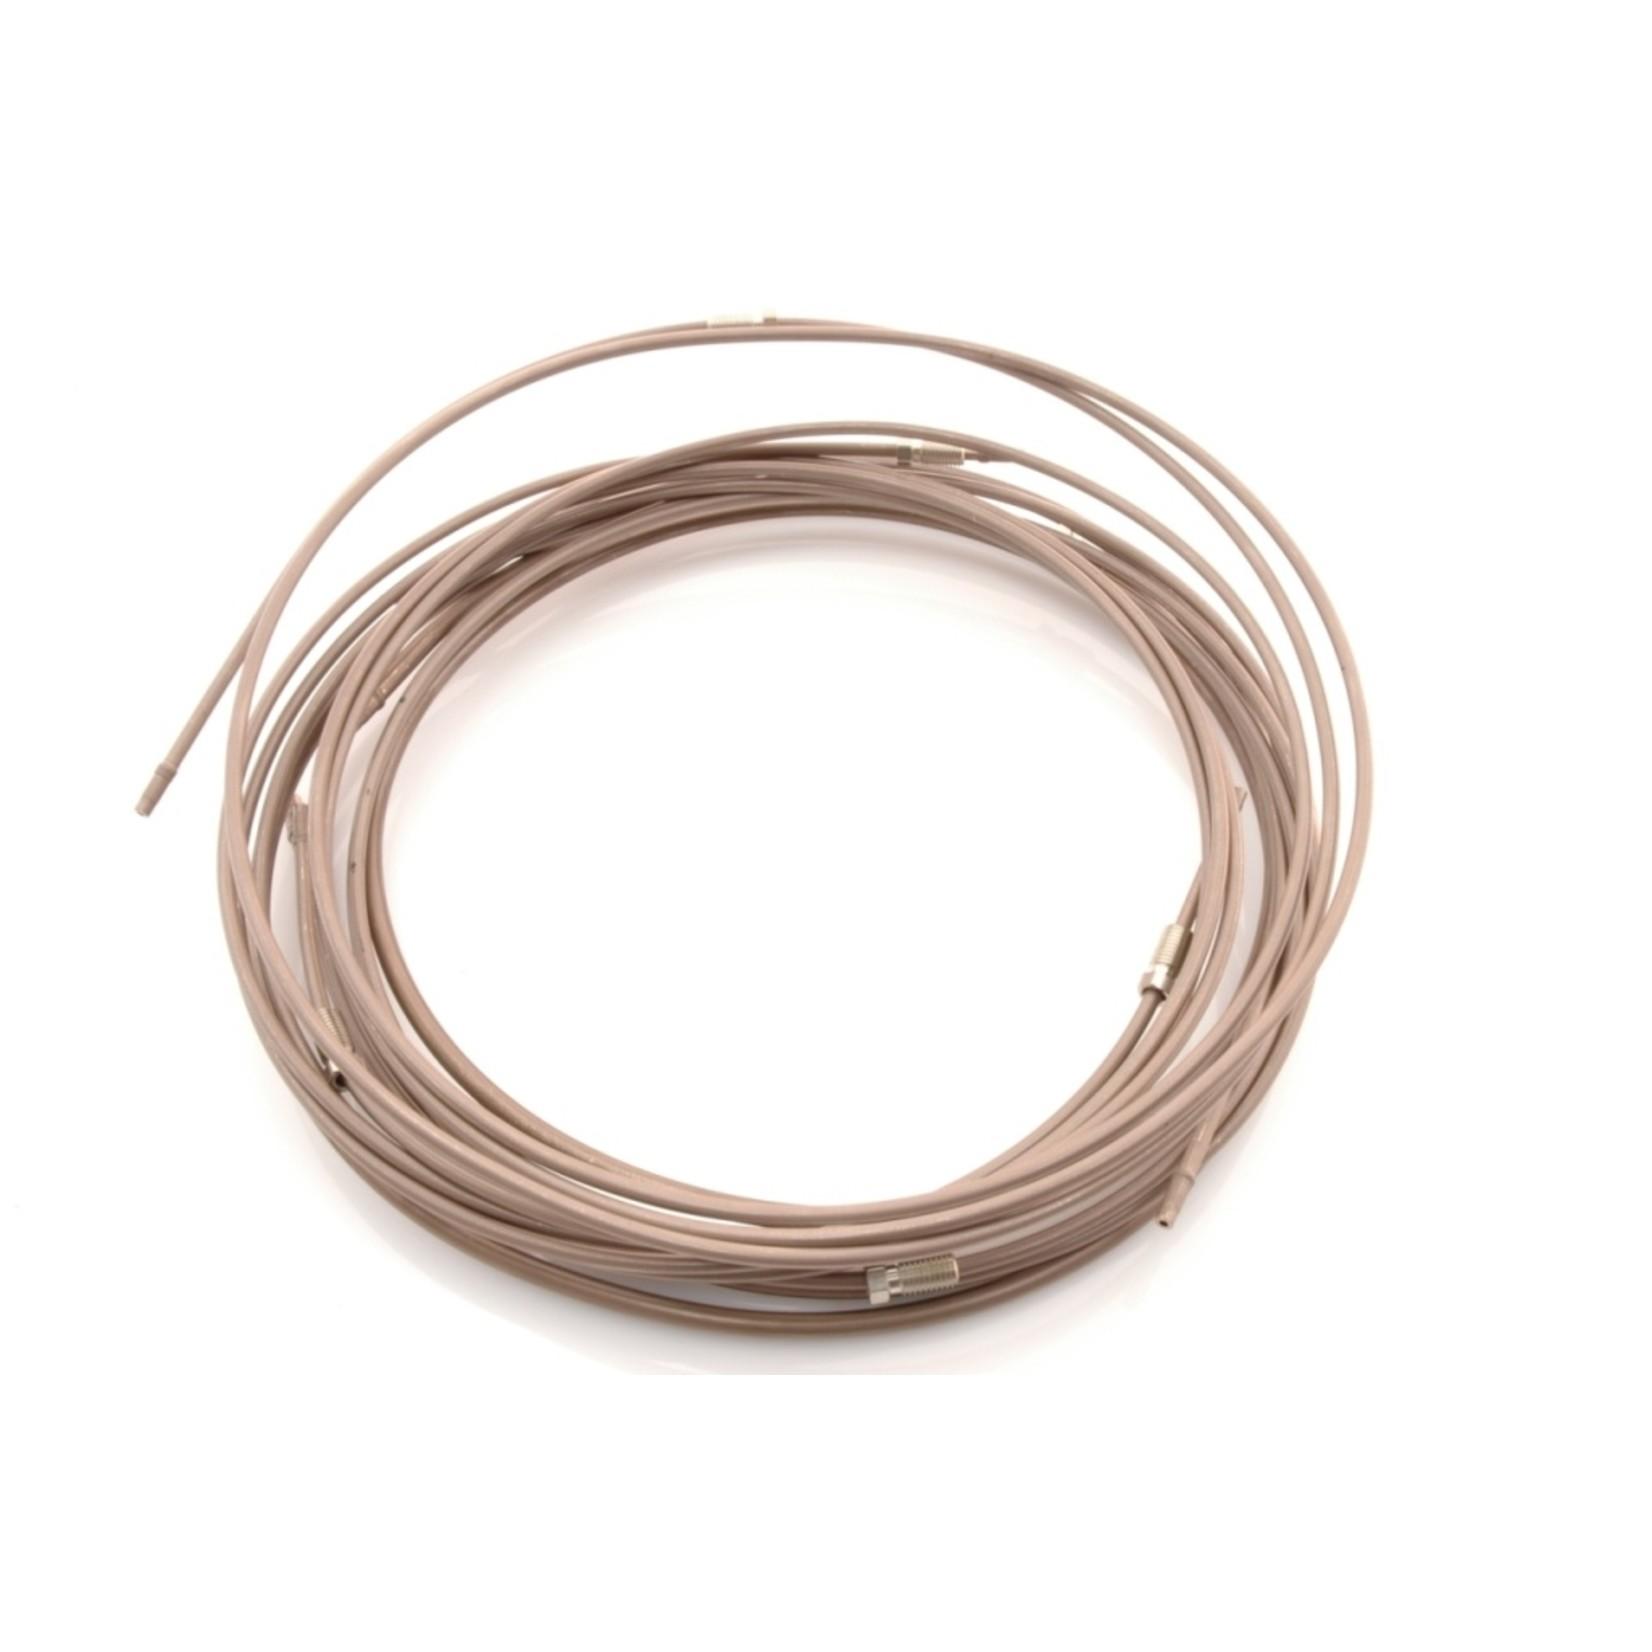 Canalizacion delantera - trasero cobre 69- 4 x 4,5mm Nr Org: DX39425